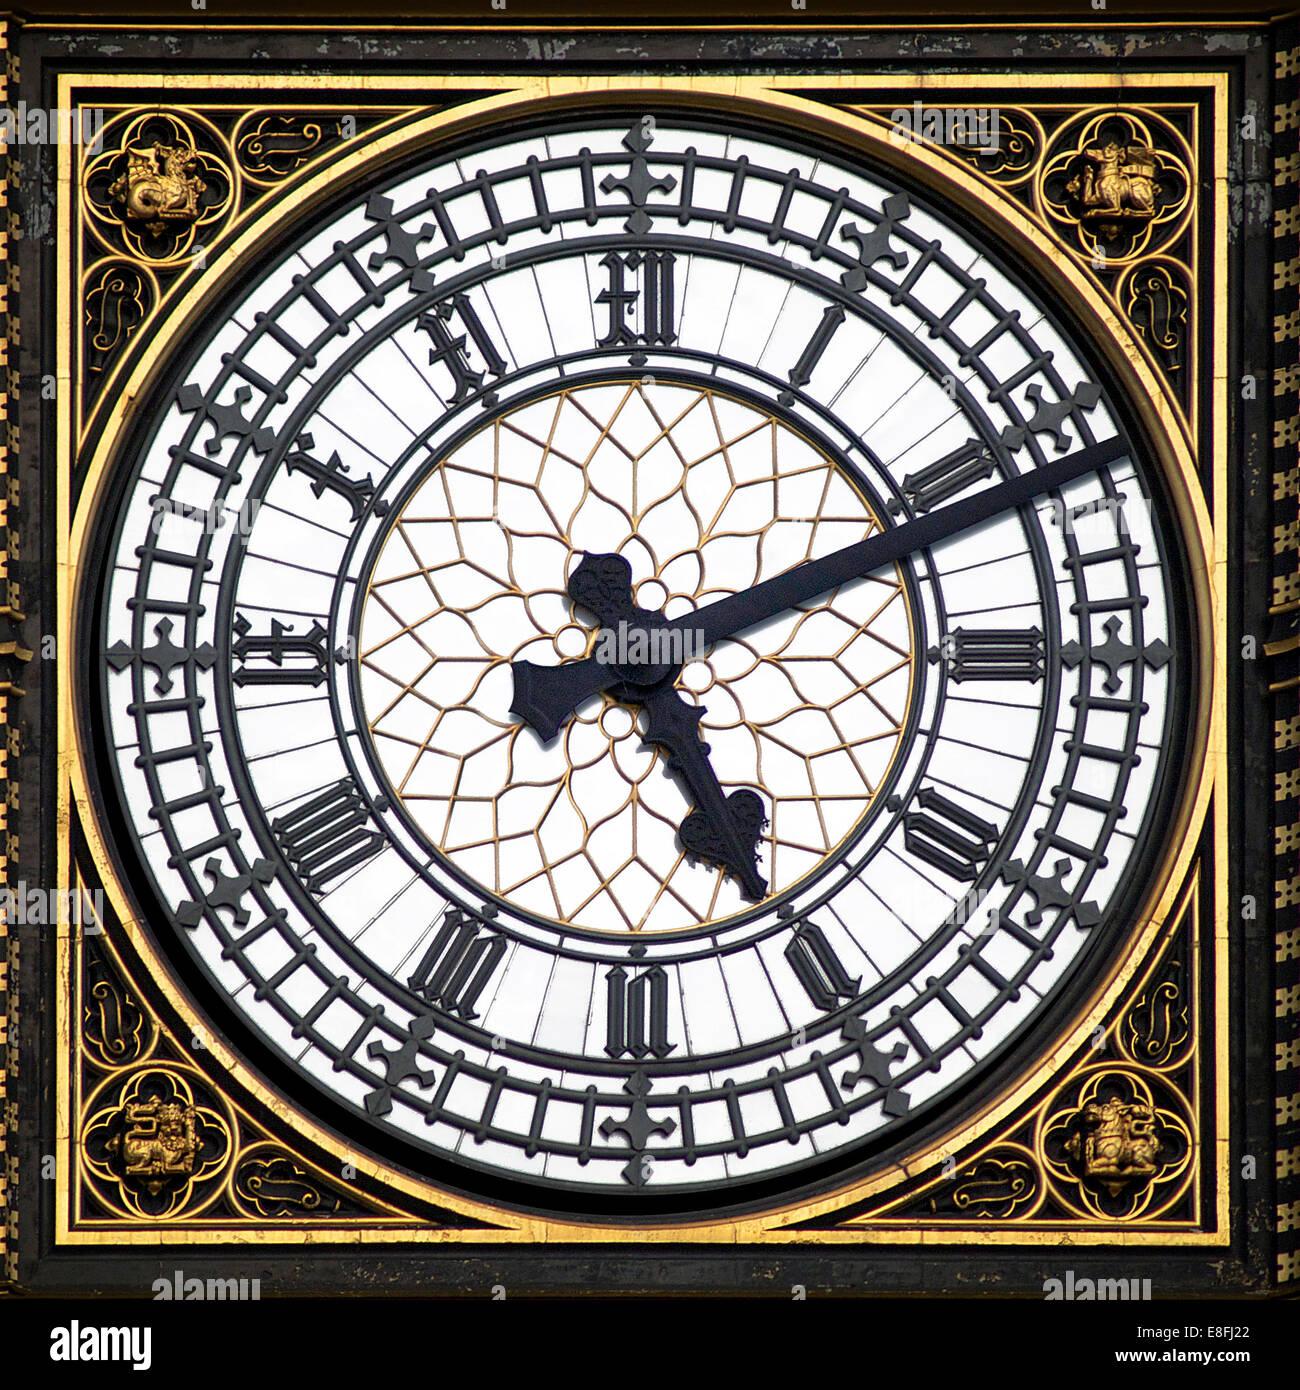 Reloj Big Ben, Londres, Inglaterra, Reino Unido. Imagen De Stock